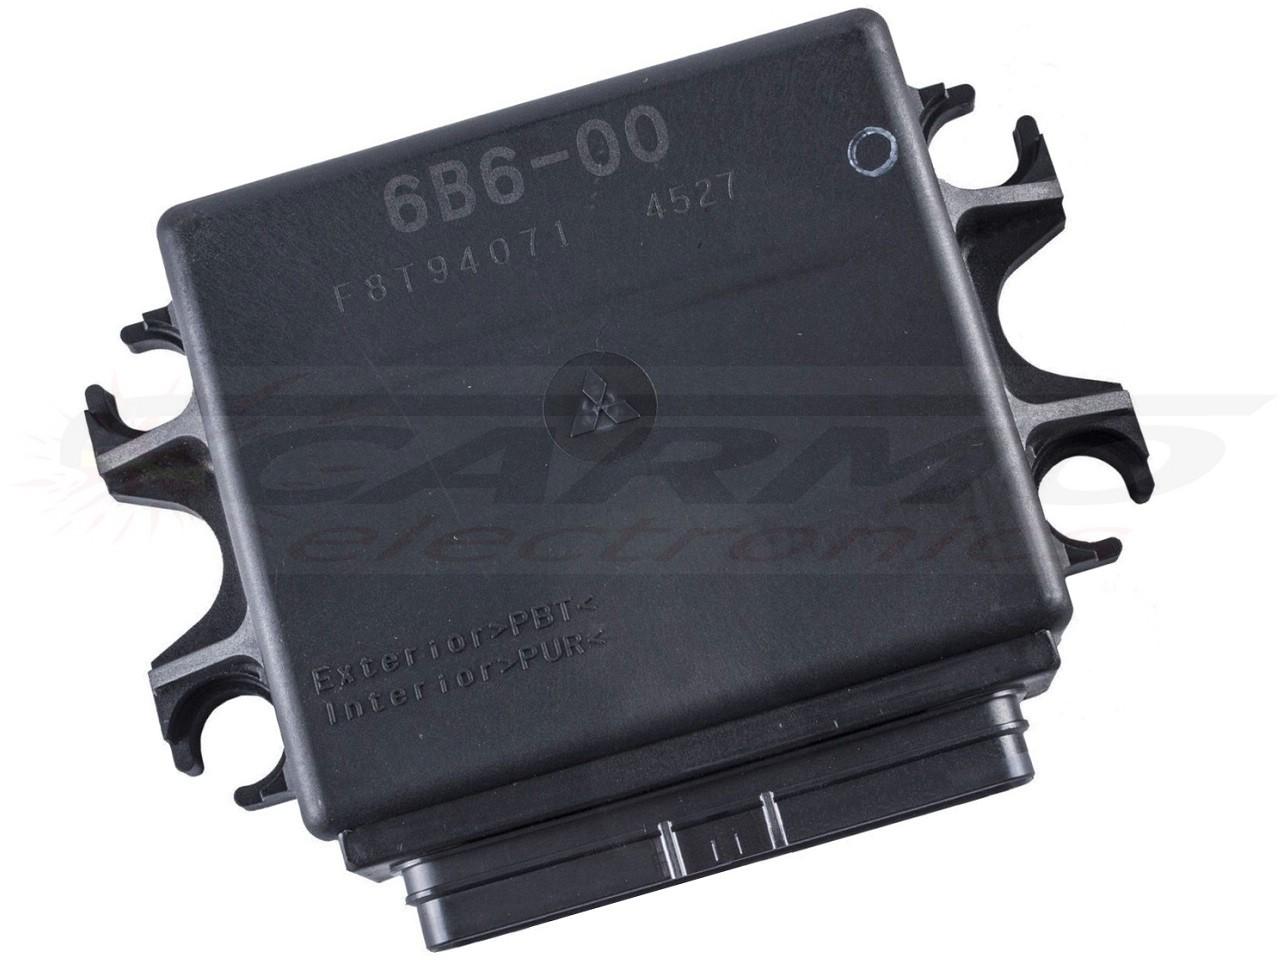 FX HO Waverunner 2003 2004 ECU ECM CDI black box computer brain